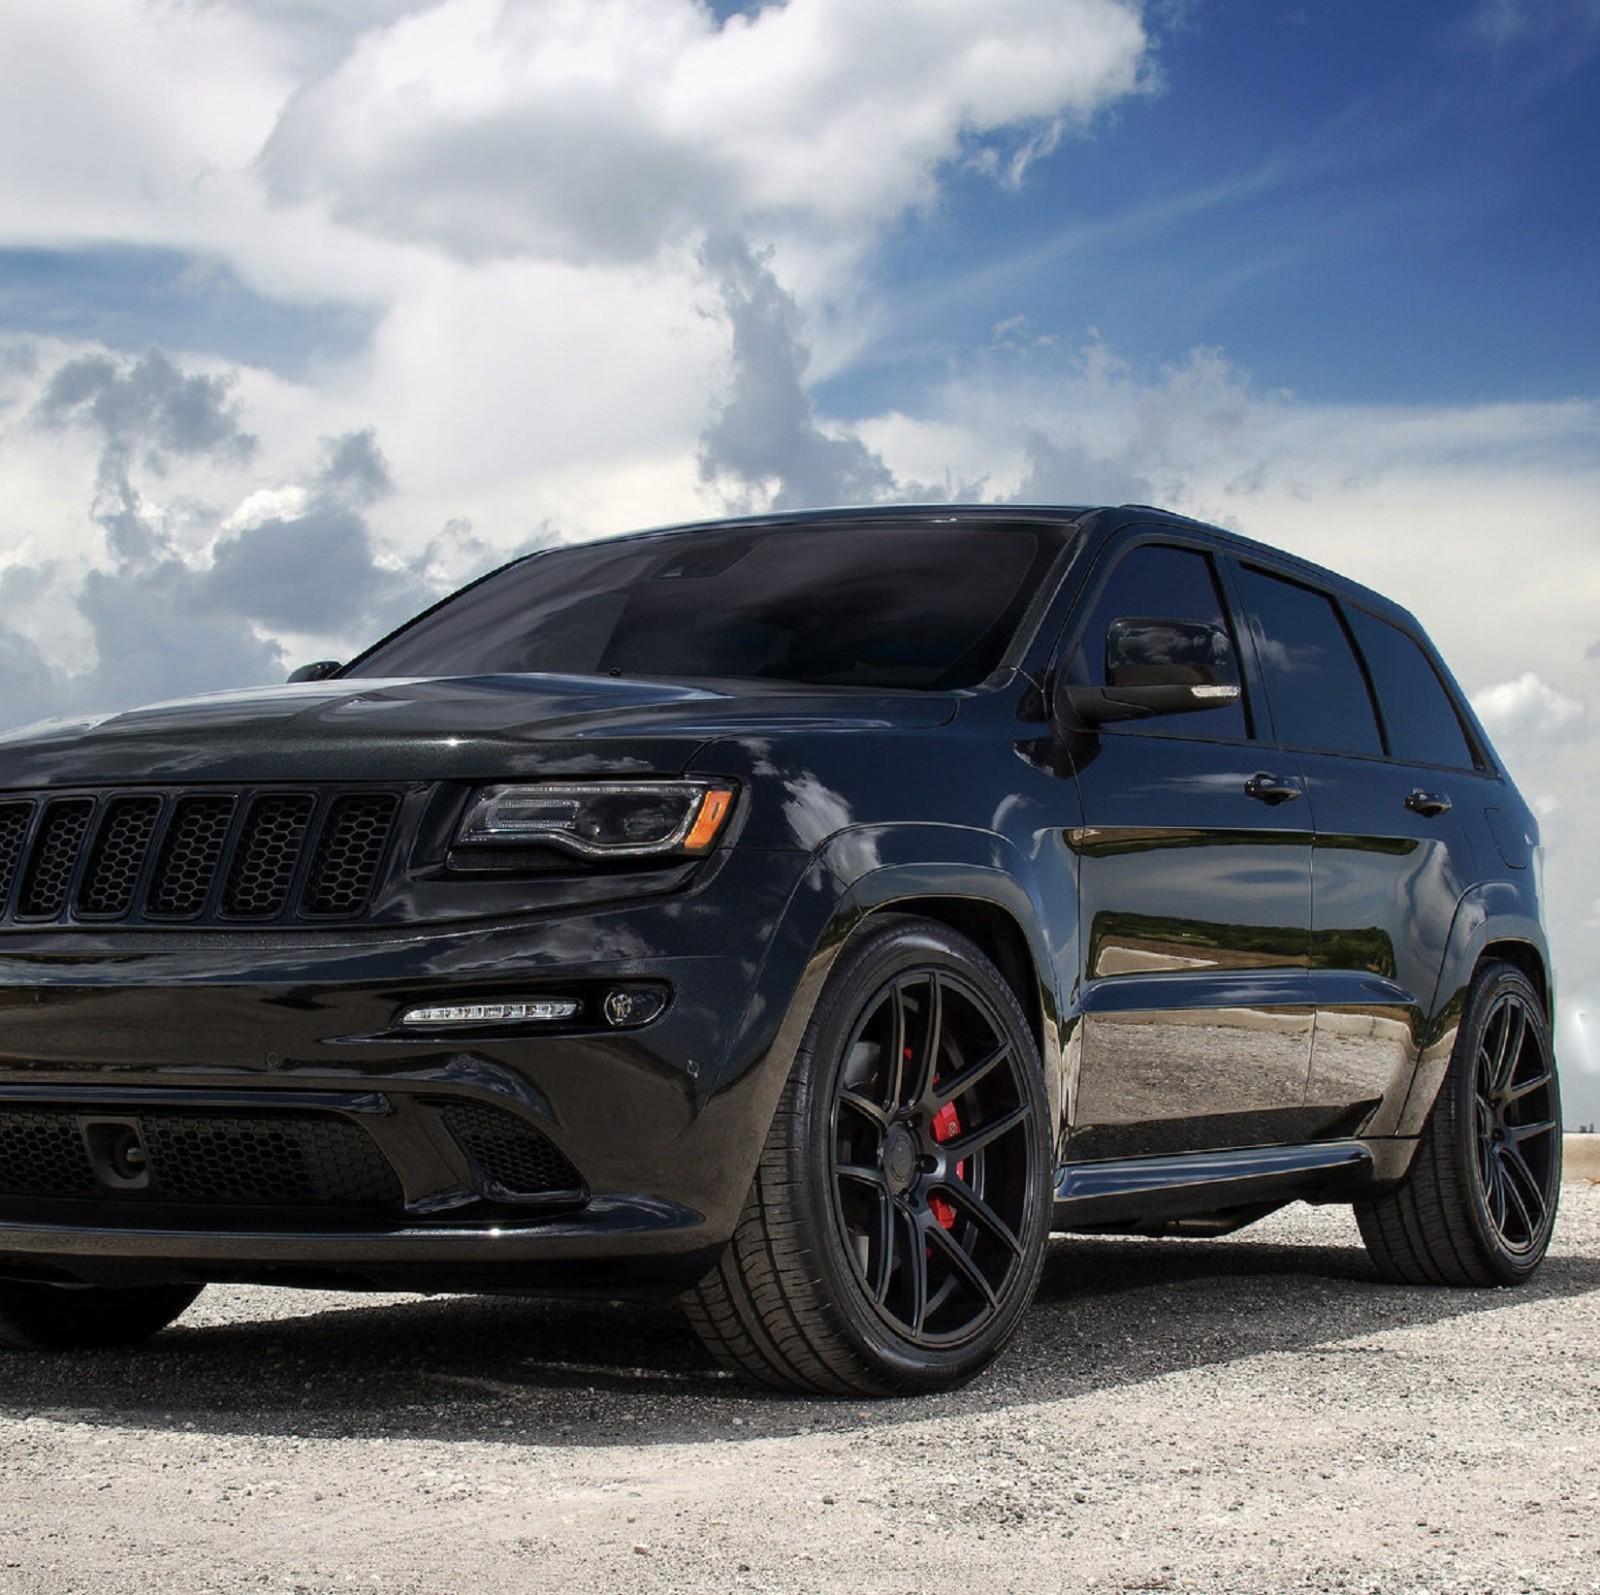 20x10 5 Velgen Vmb5 Black Concave Wheels Rims For Jeep Grand Cherokee Dodge Ebay